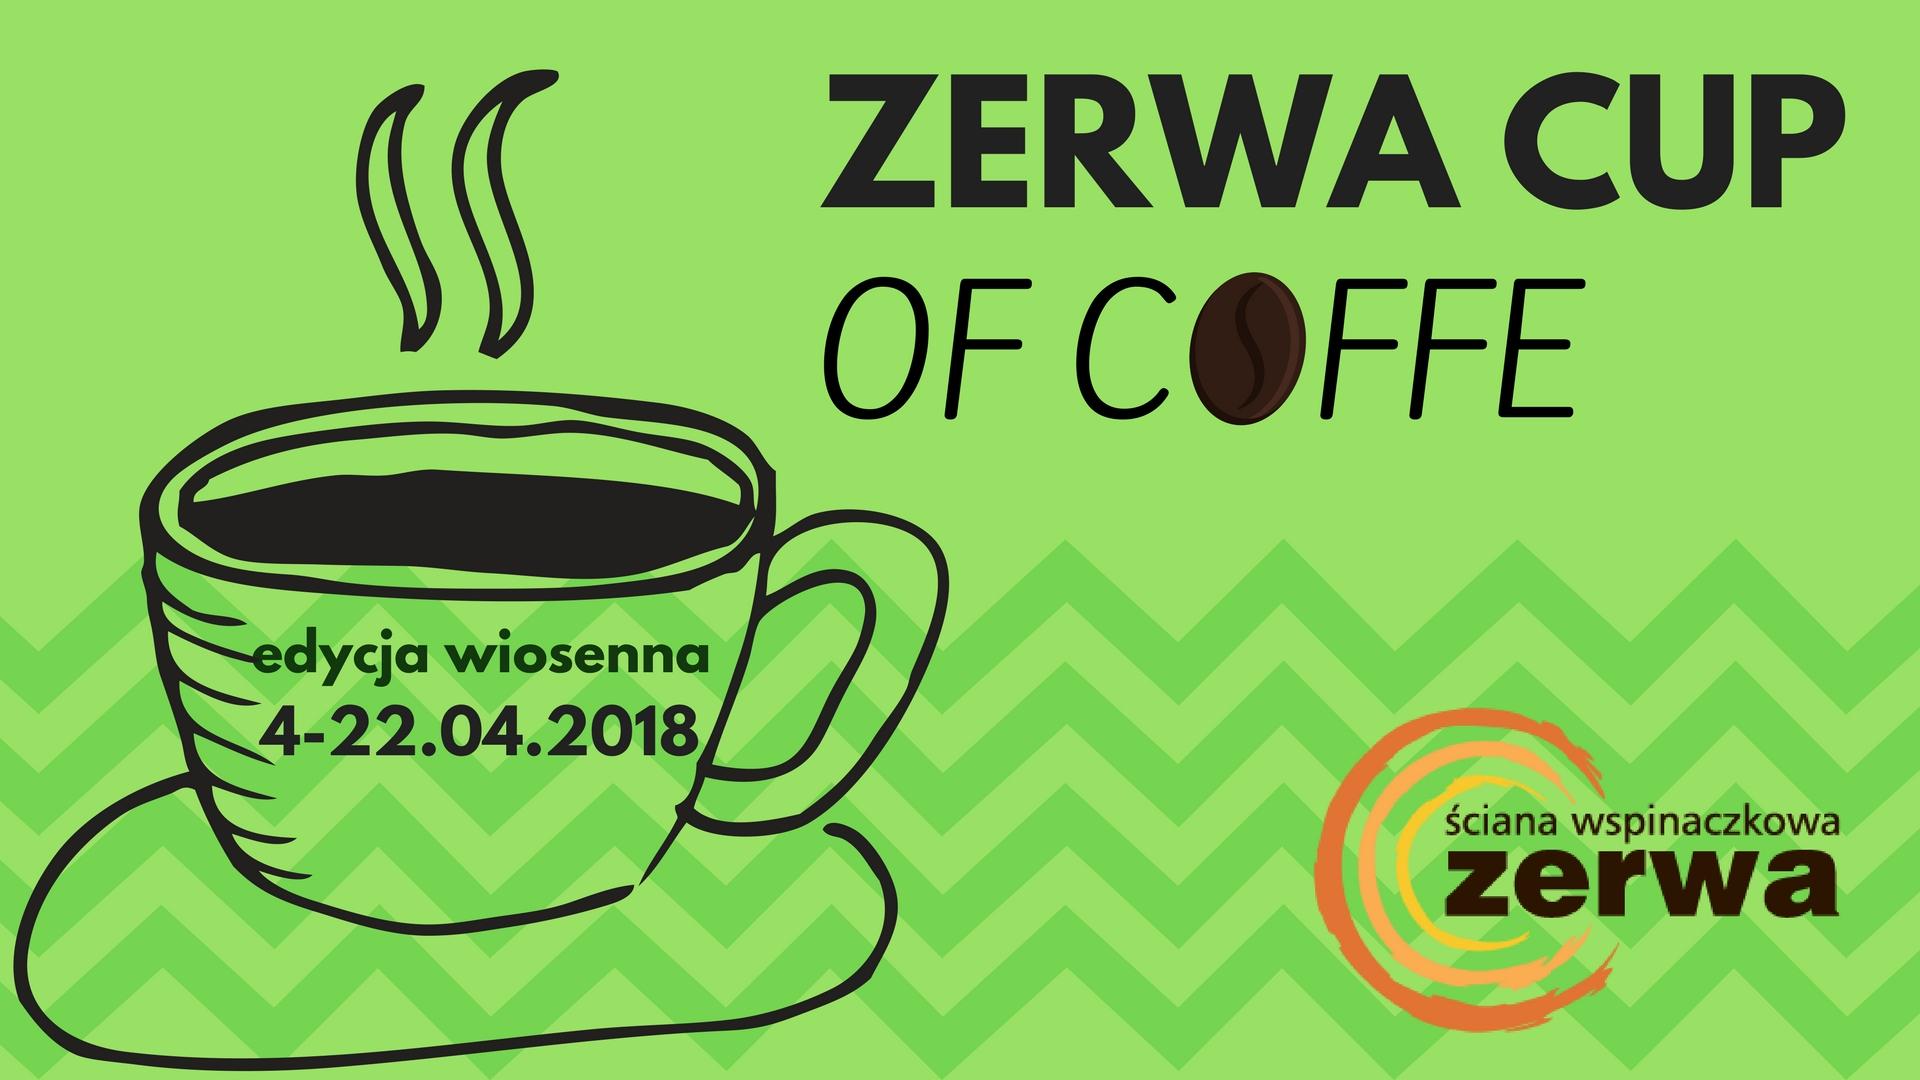 ZERWA CUP — kopia (1)